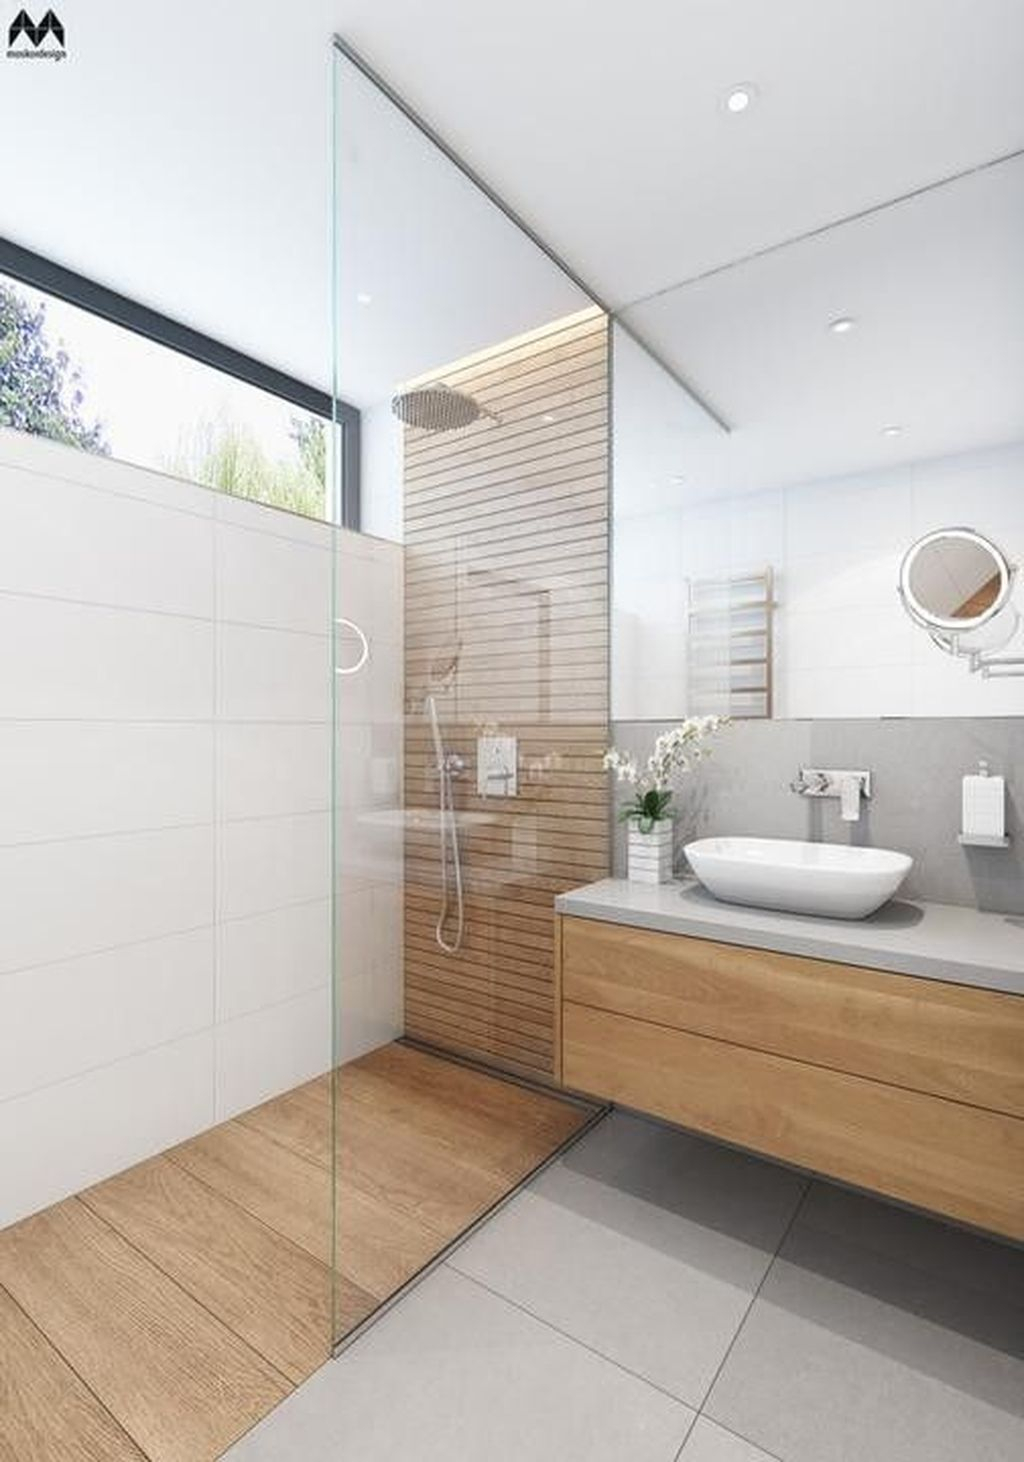 Marvelous Wooden Shower Floor Tiles Designs Ideas For Bathroom Remodel 05